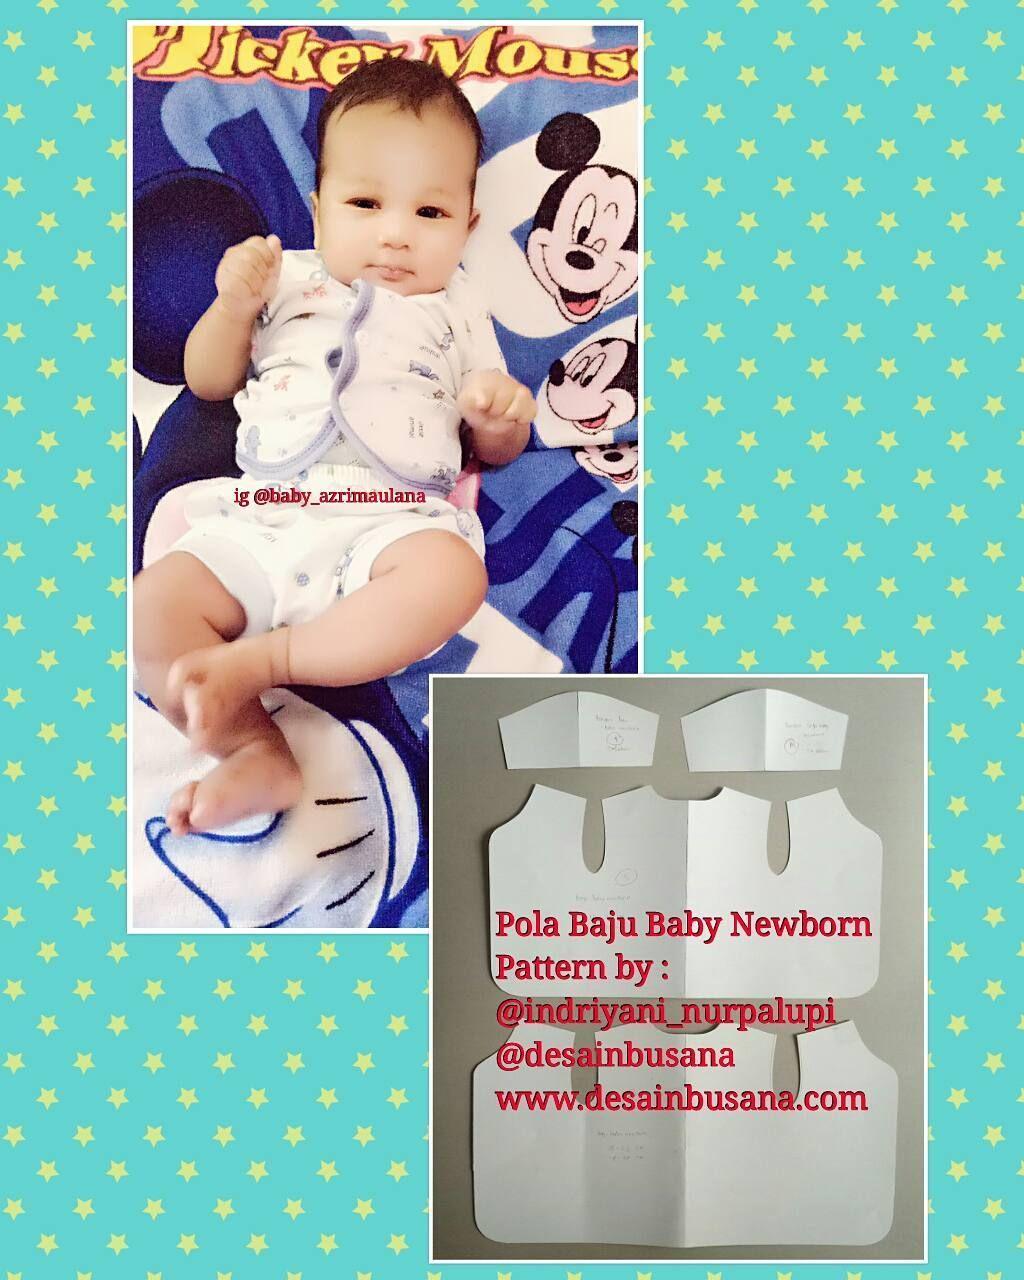 Jual Pola Baju Bayi Newborn Cara Mudah Jahit Baju Tanpa Ribet Buat Pola Tinggal Jiplak Ke Kain Lalu Gunting Sesuai Pola Whatsapp 081296 Bayi Jahit Baju Bayi